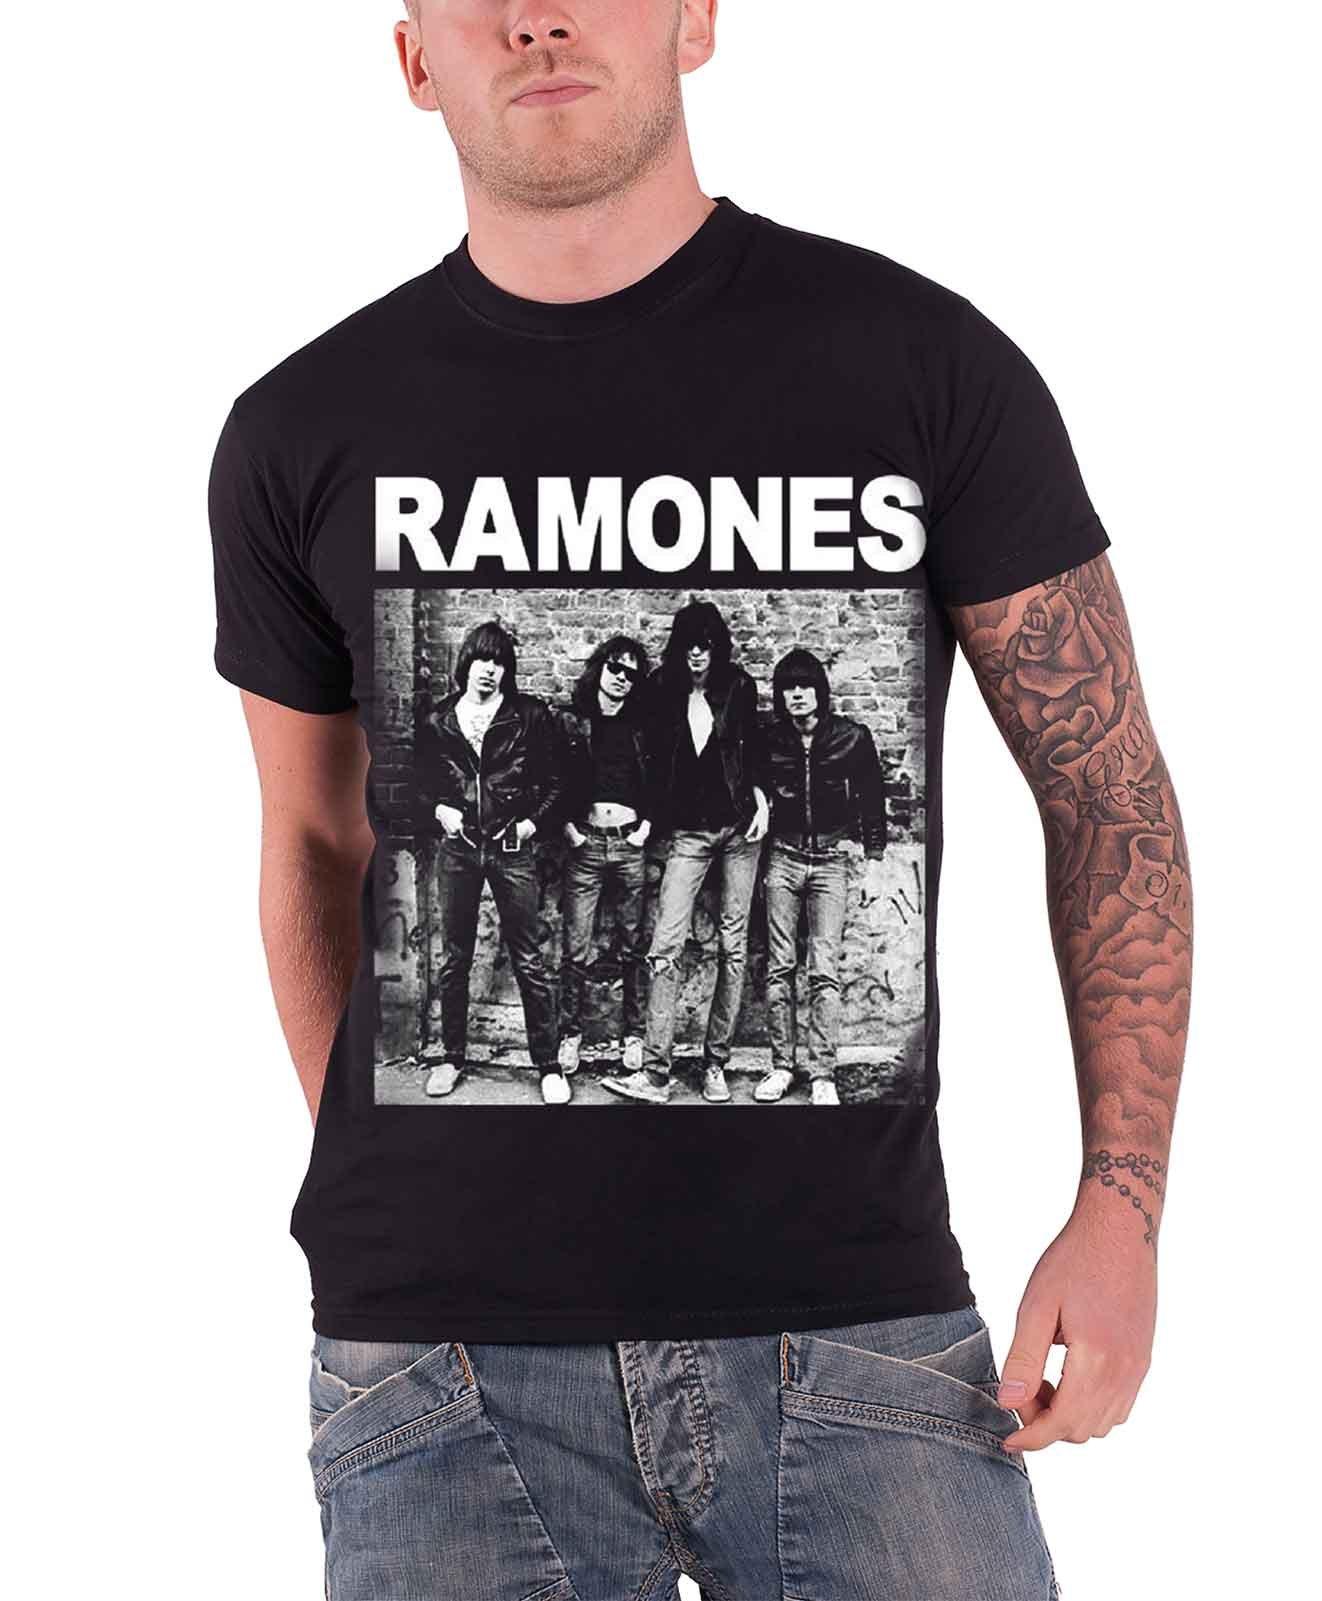 Ramones 1st Album New Official Mens Black T Shirt